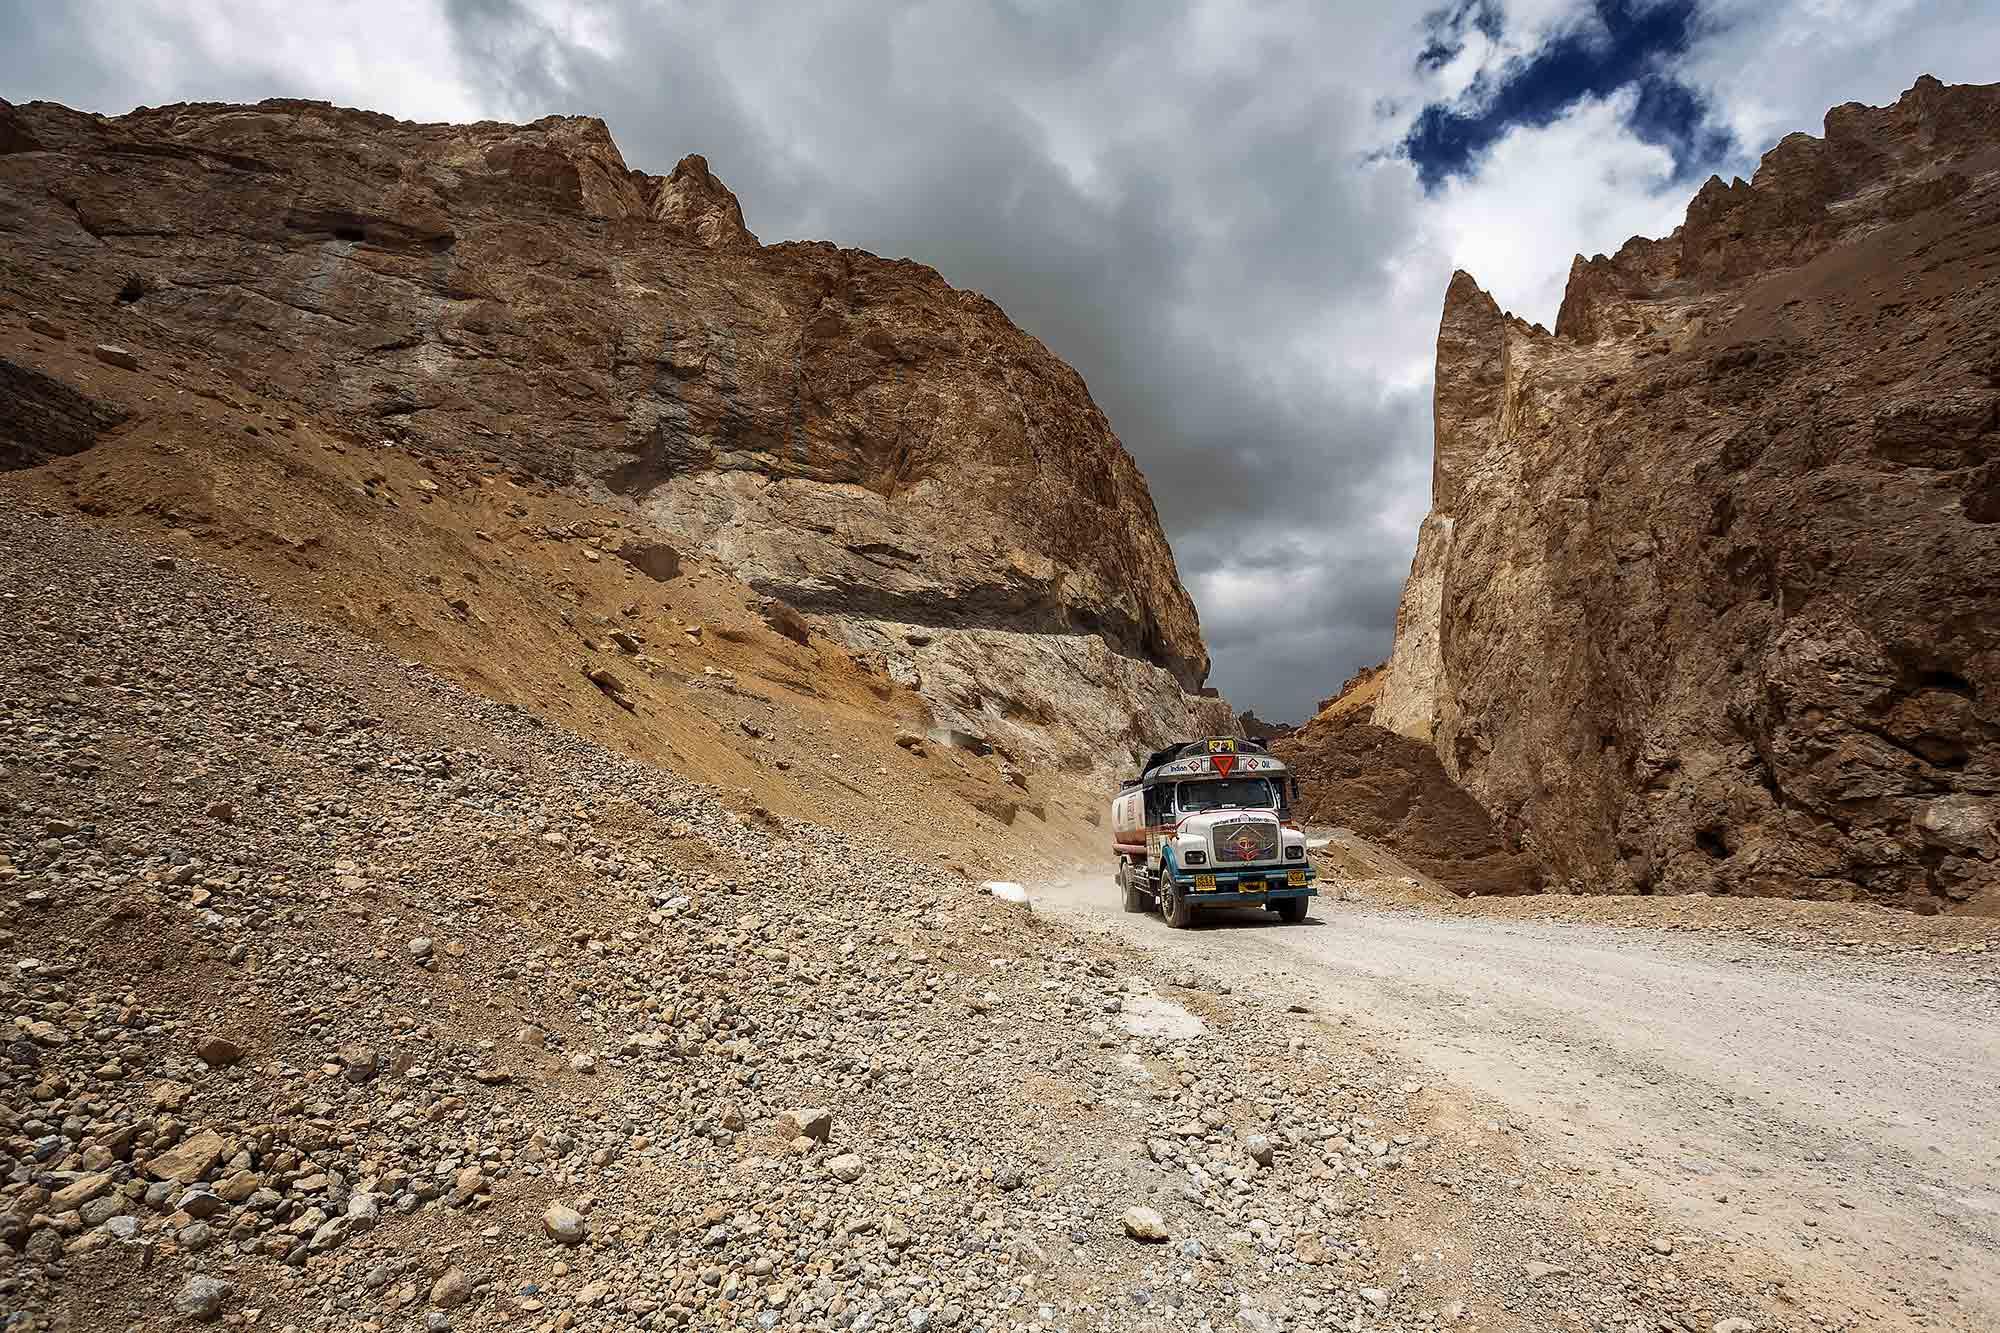 truck-leh-manali-highway-kashmir-ladakh-india